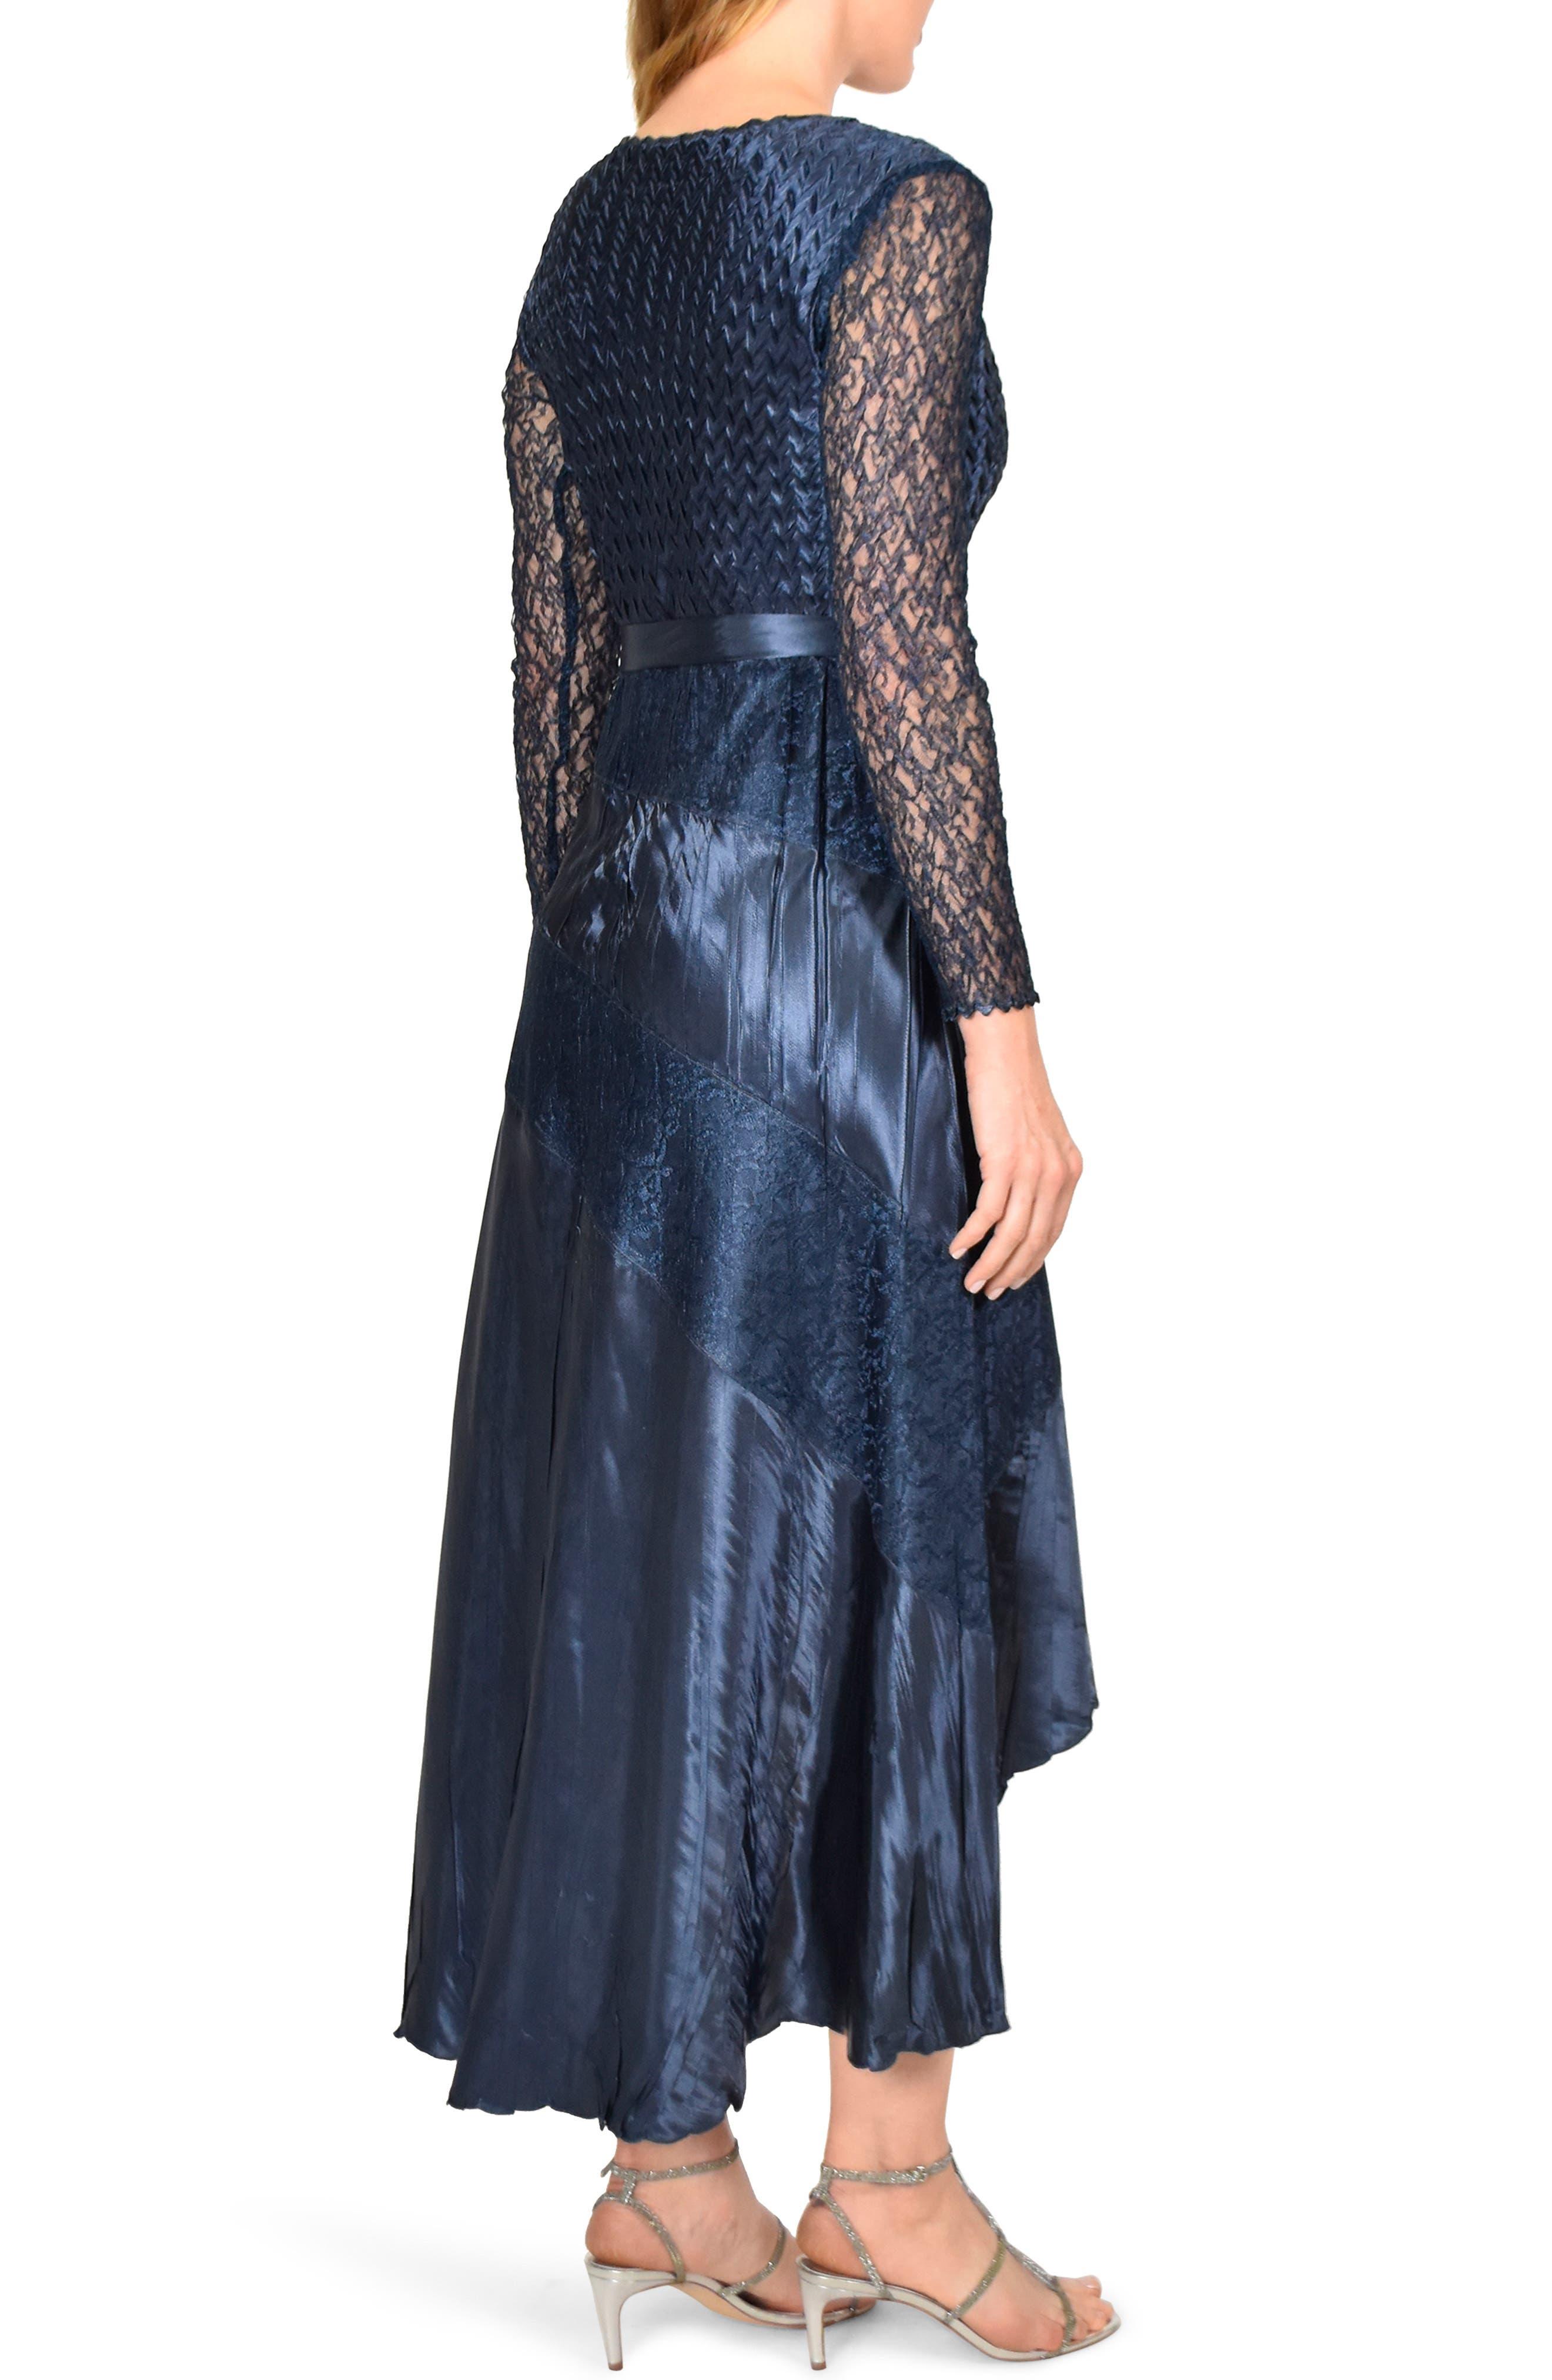 KOMAROV, Charmeuse & Chiffon High/Low Hem Dress, Alternate thumbnail 2, color, ECLIPSE